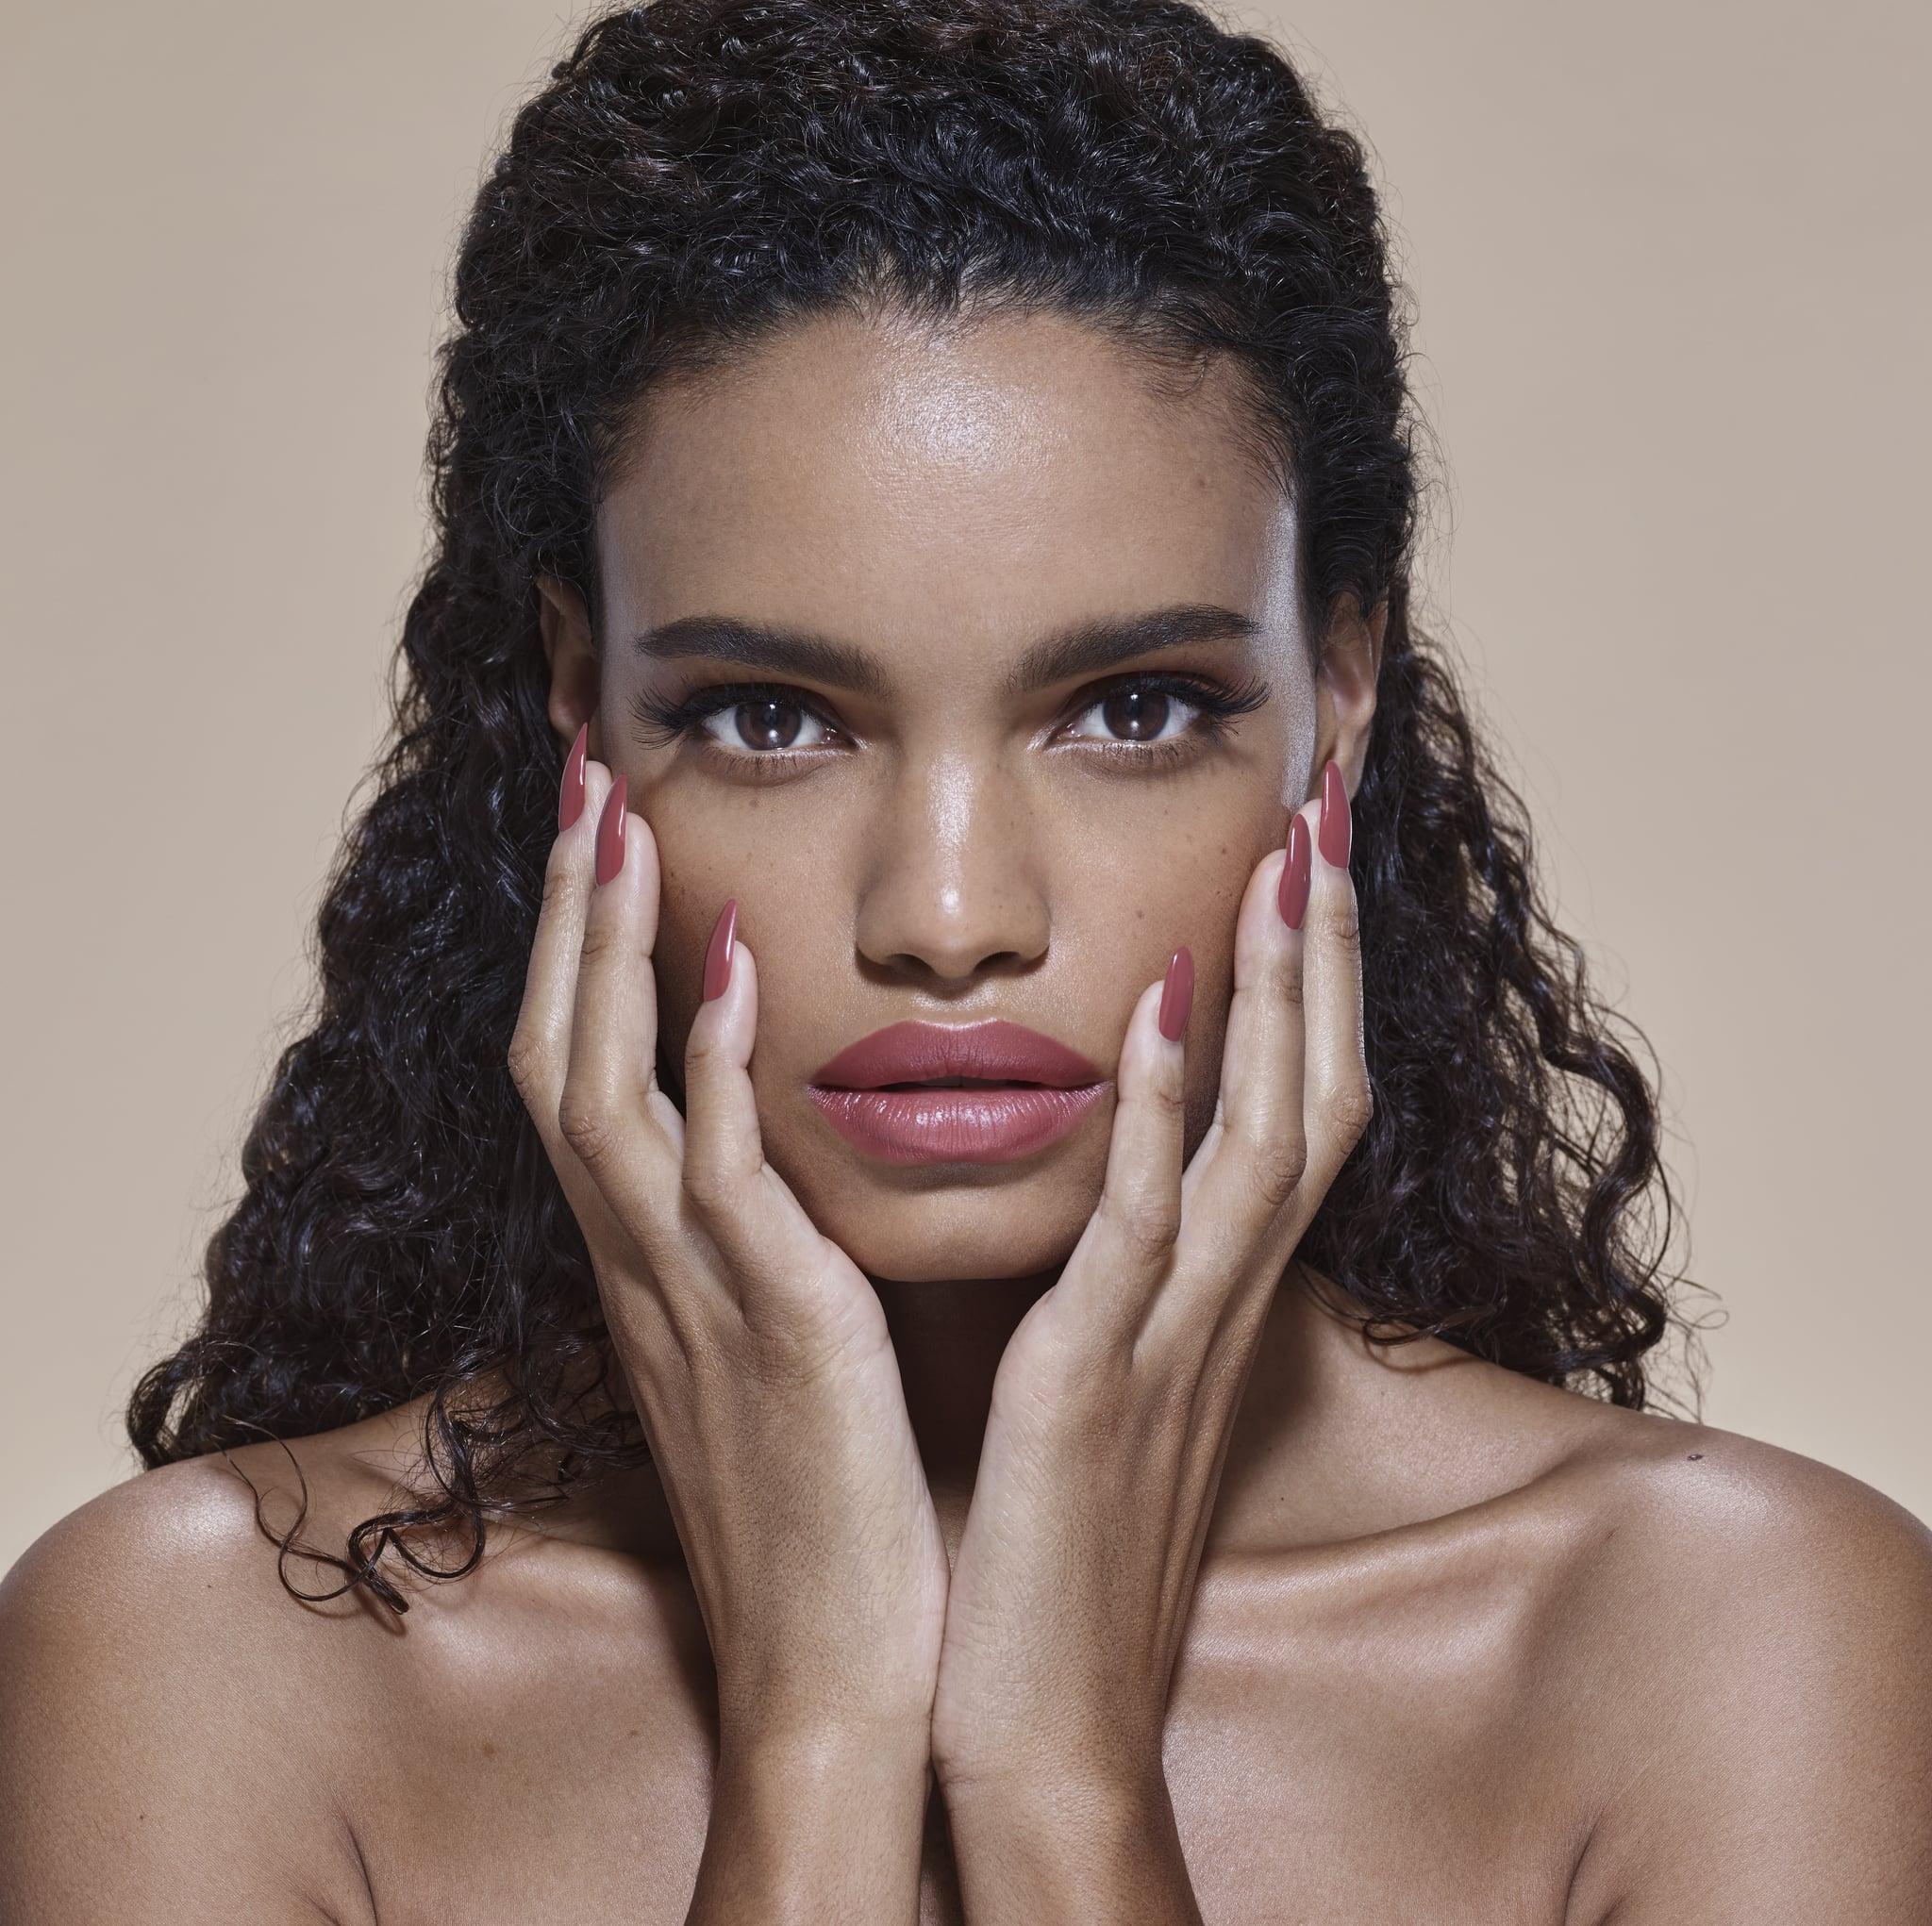 Emolyne Cosmetics